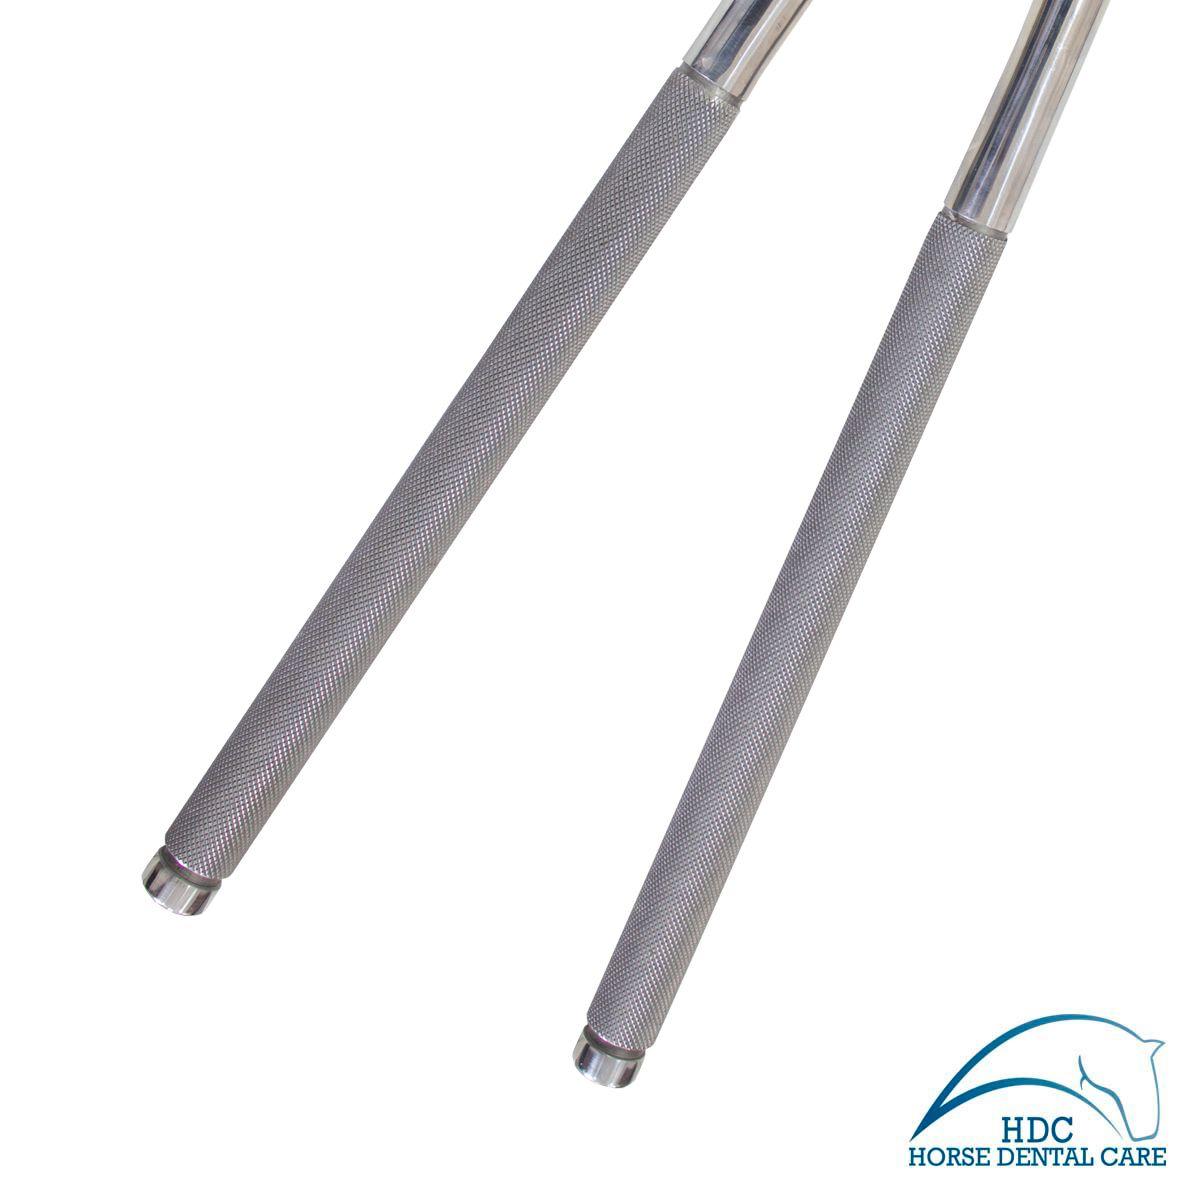 Afastador (Spreader) de Molares e Pré-Molares Caudal (Distal) 6mm